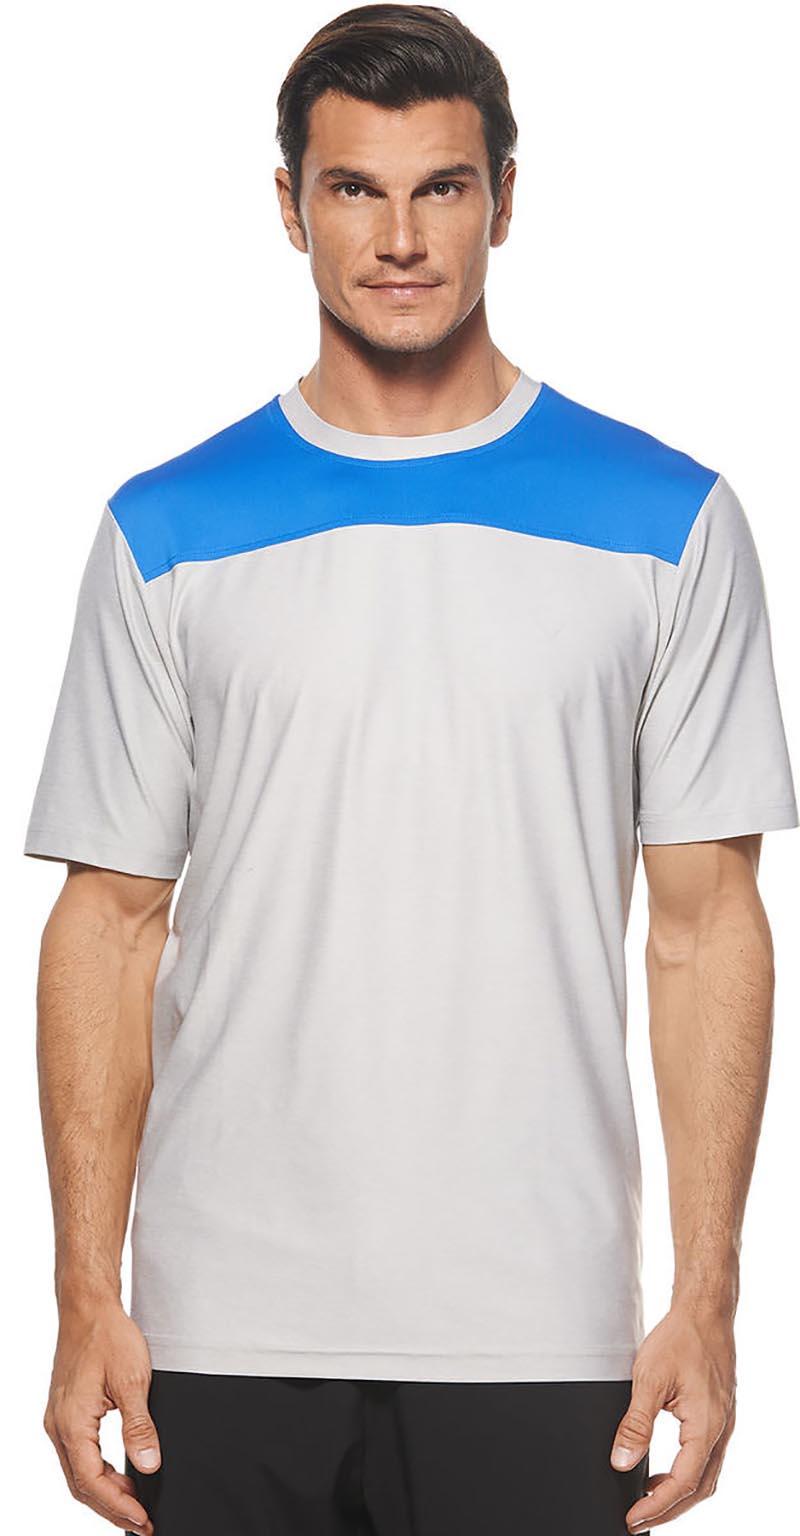 Camiseta de golf callaway cuello redondo